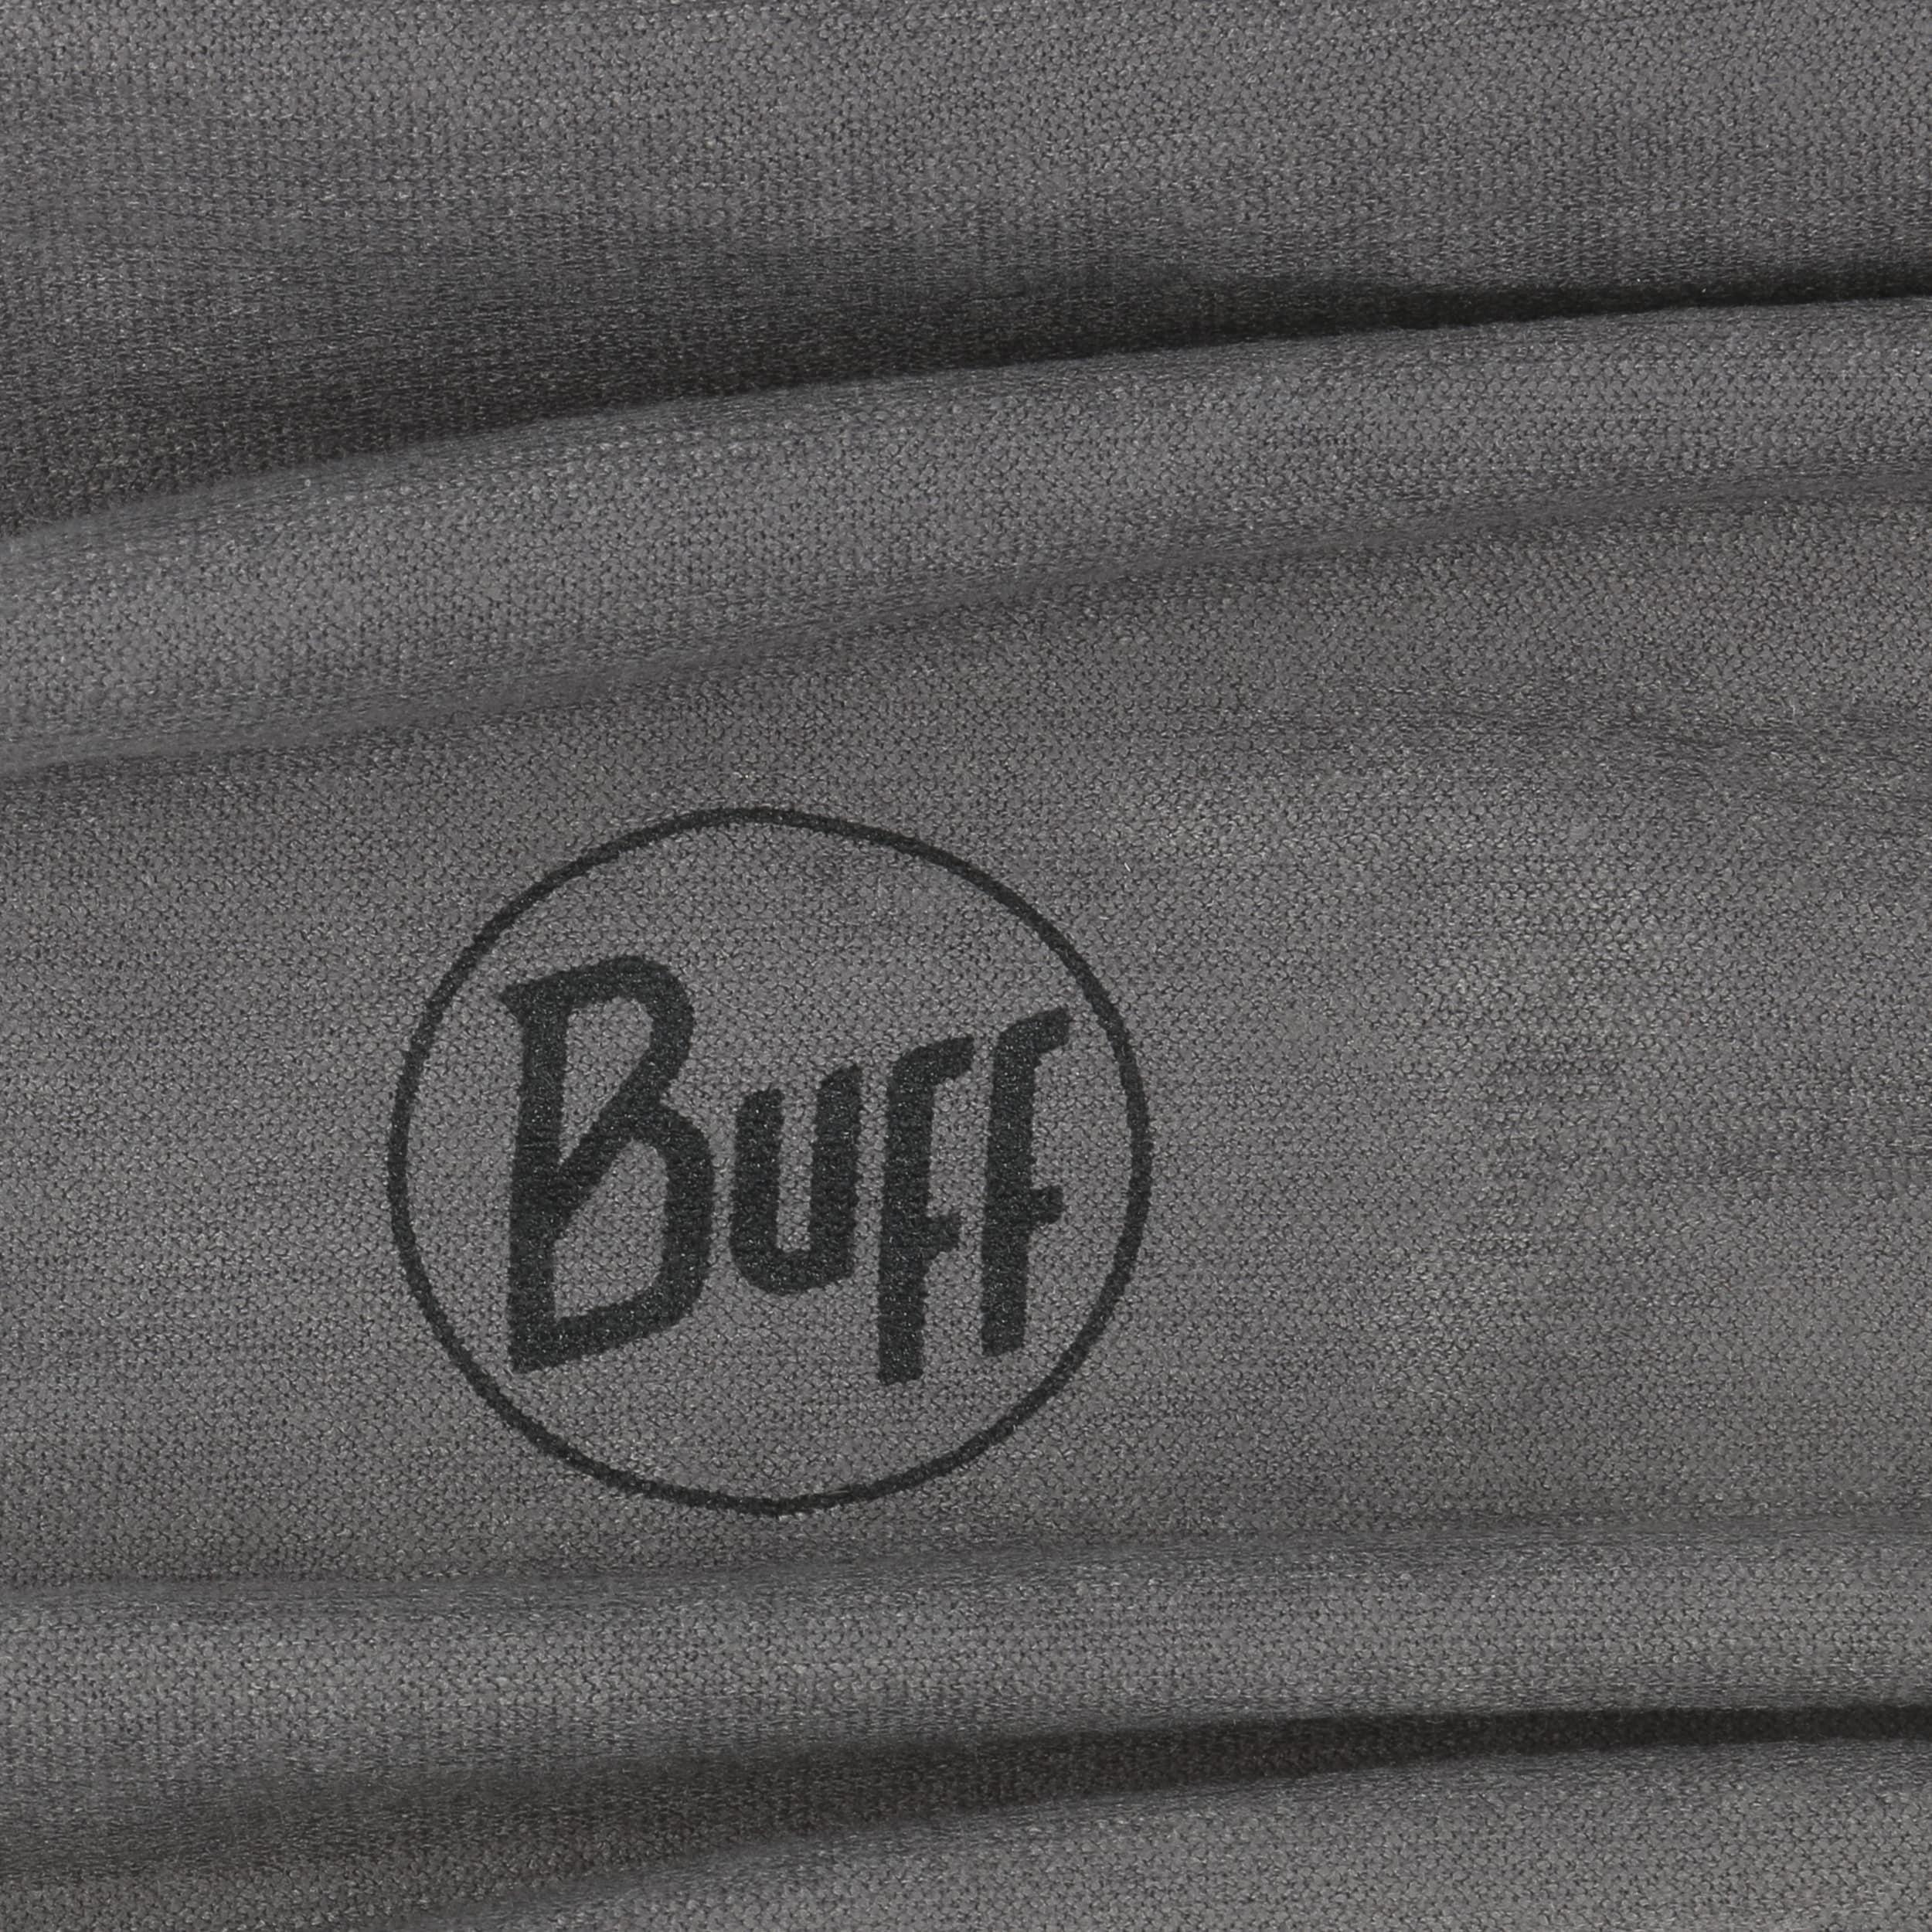 Buff Tubular Multifuncional Throwies Black Cinta para la Cabeza Bandana